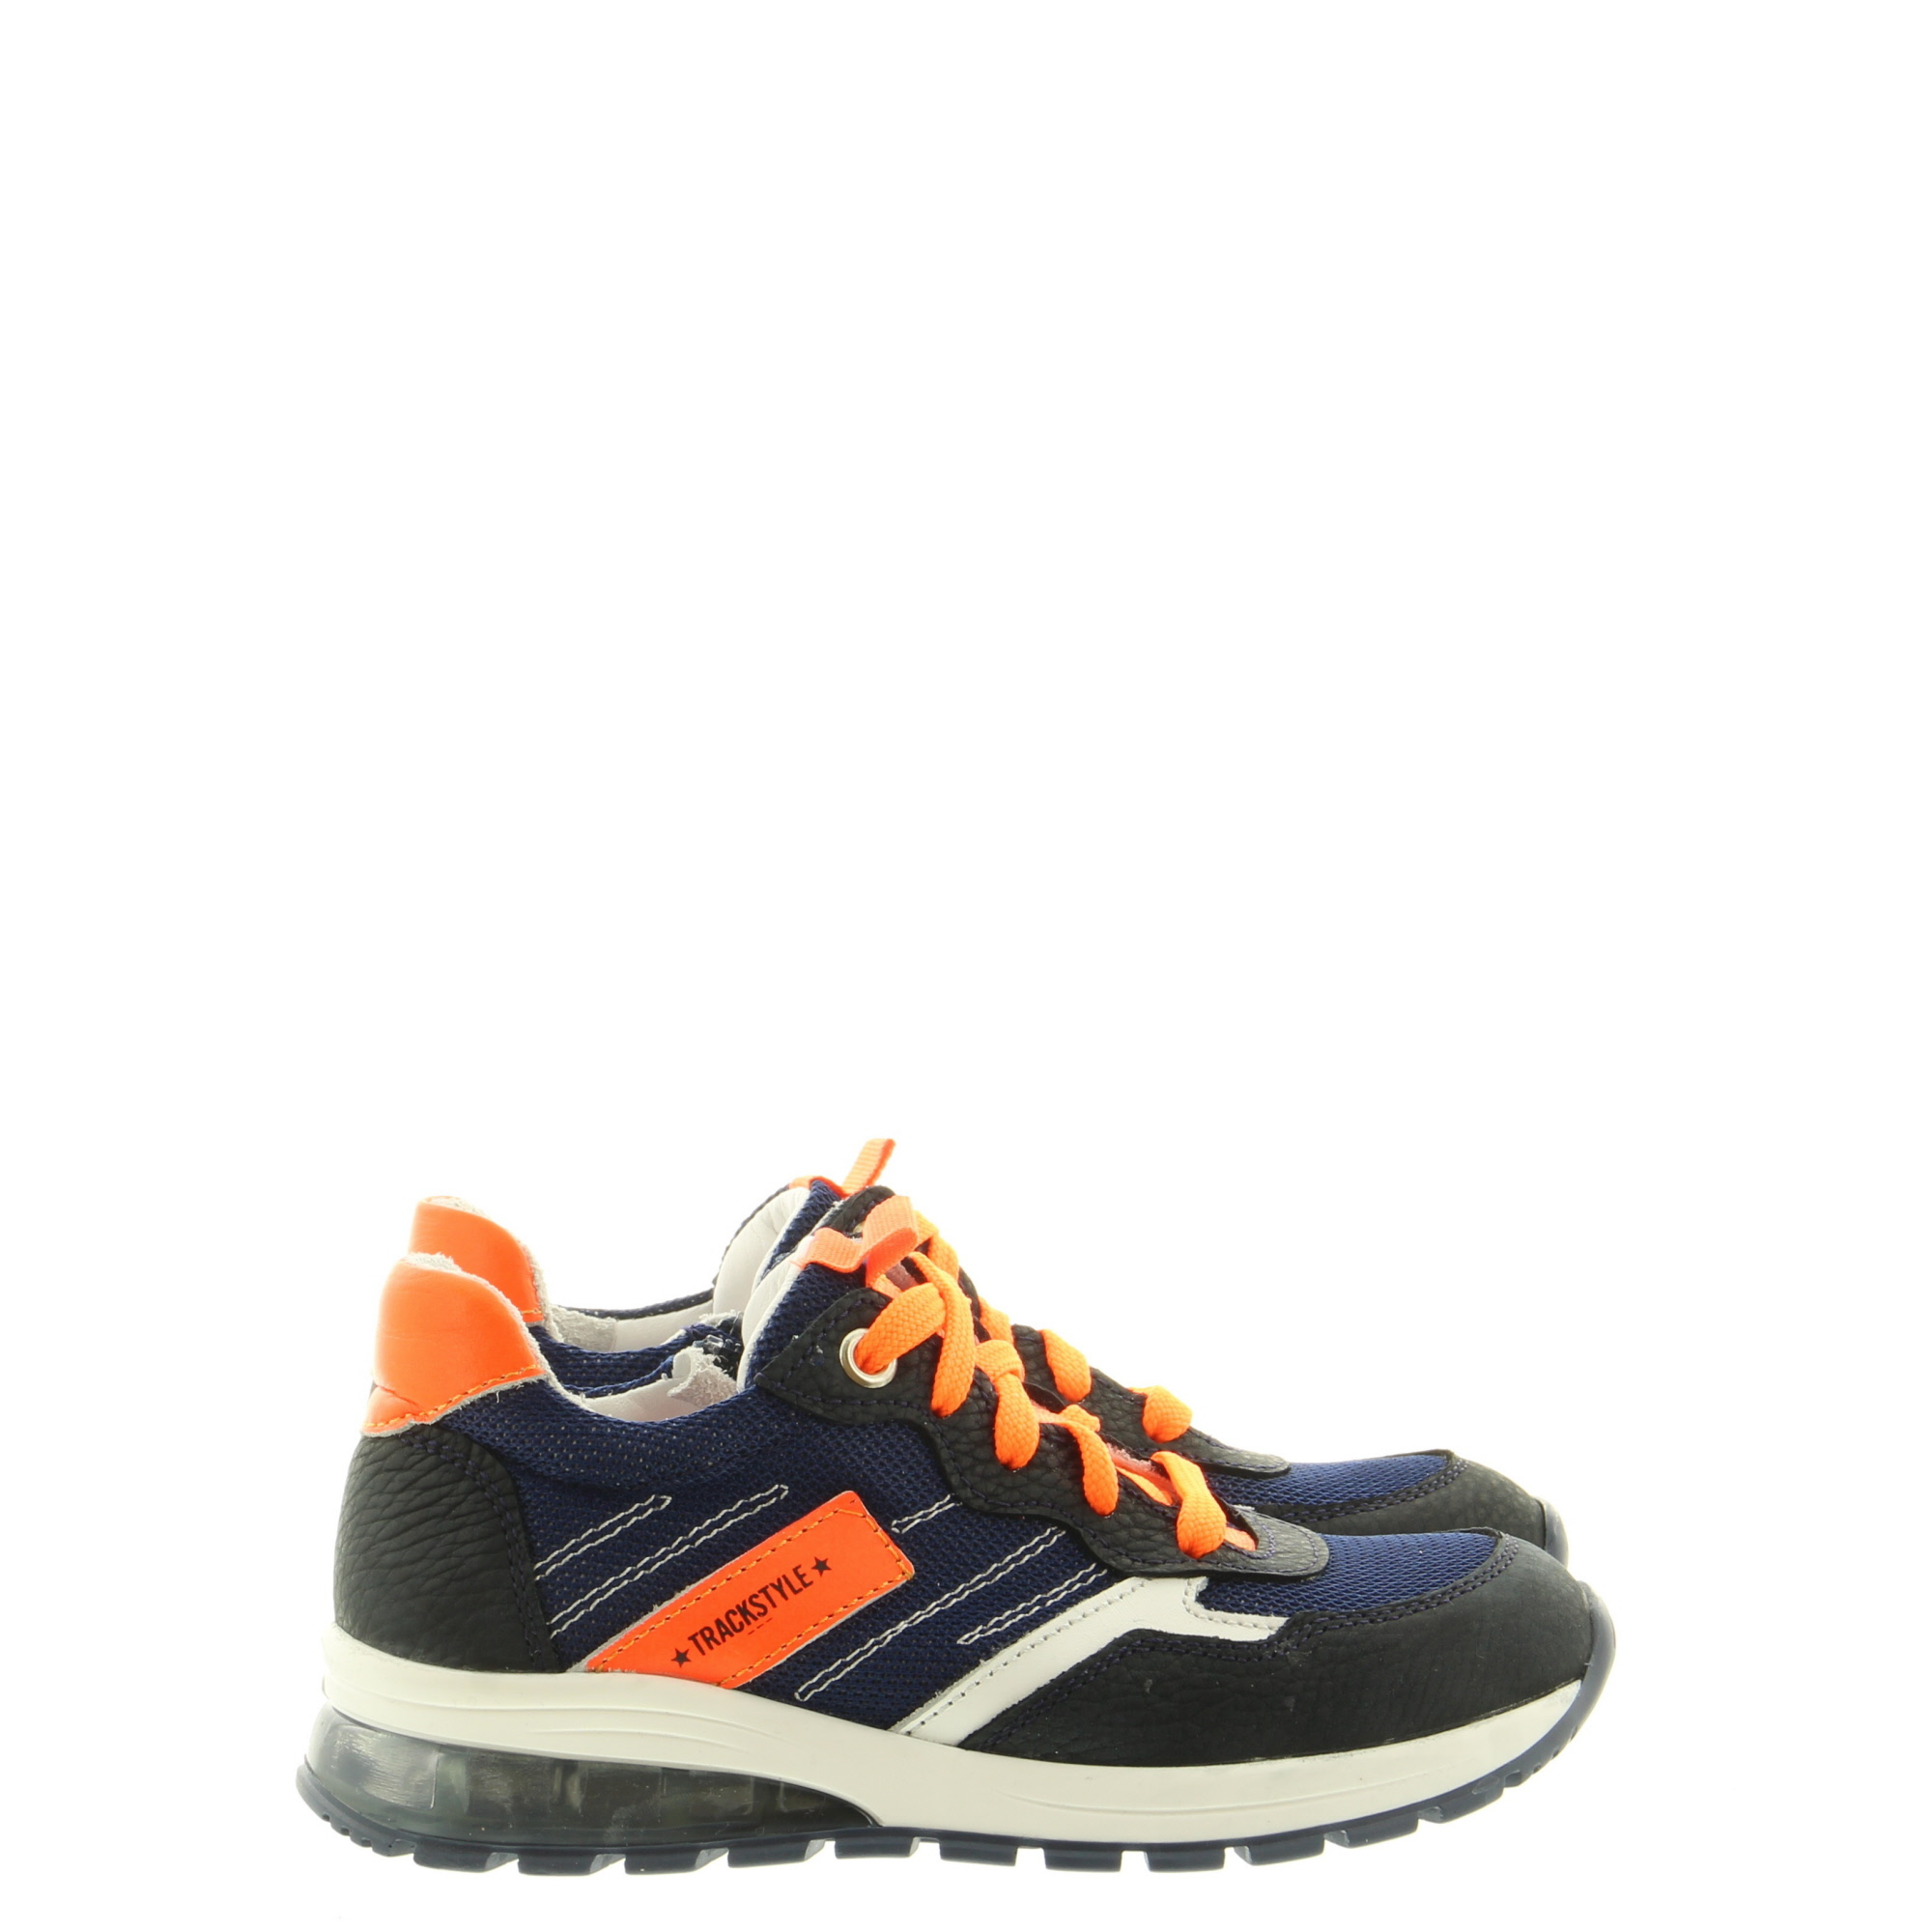 Twins Trackstyle 321350 129 D.Blue Orange